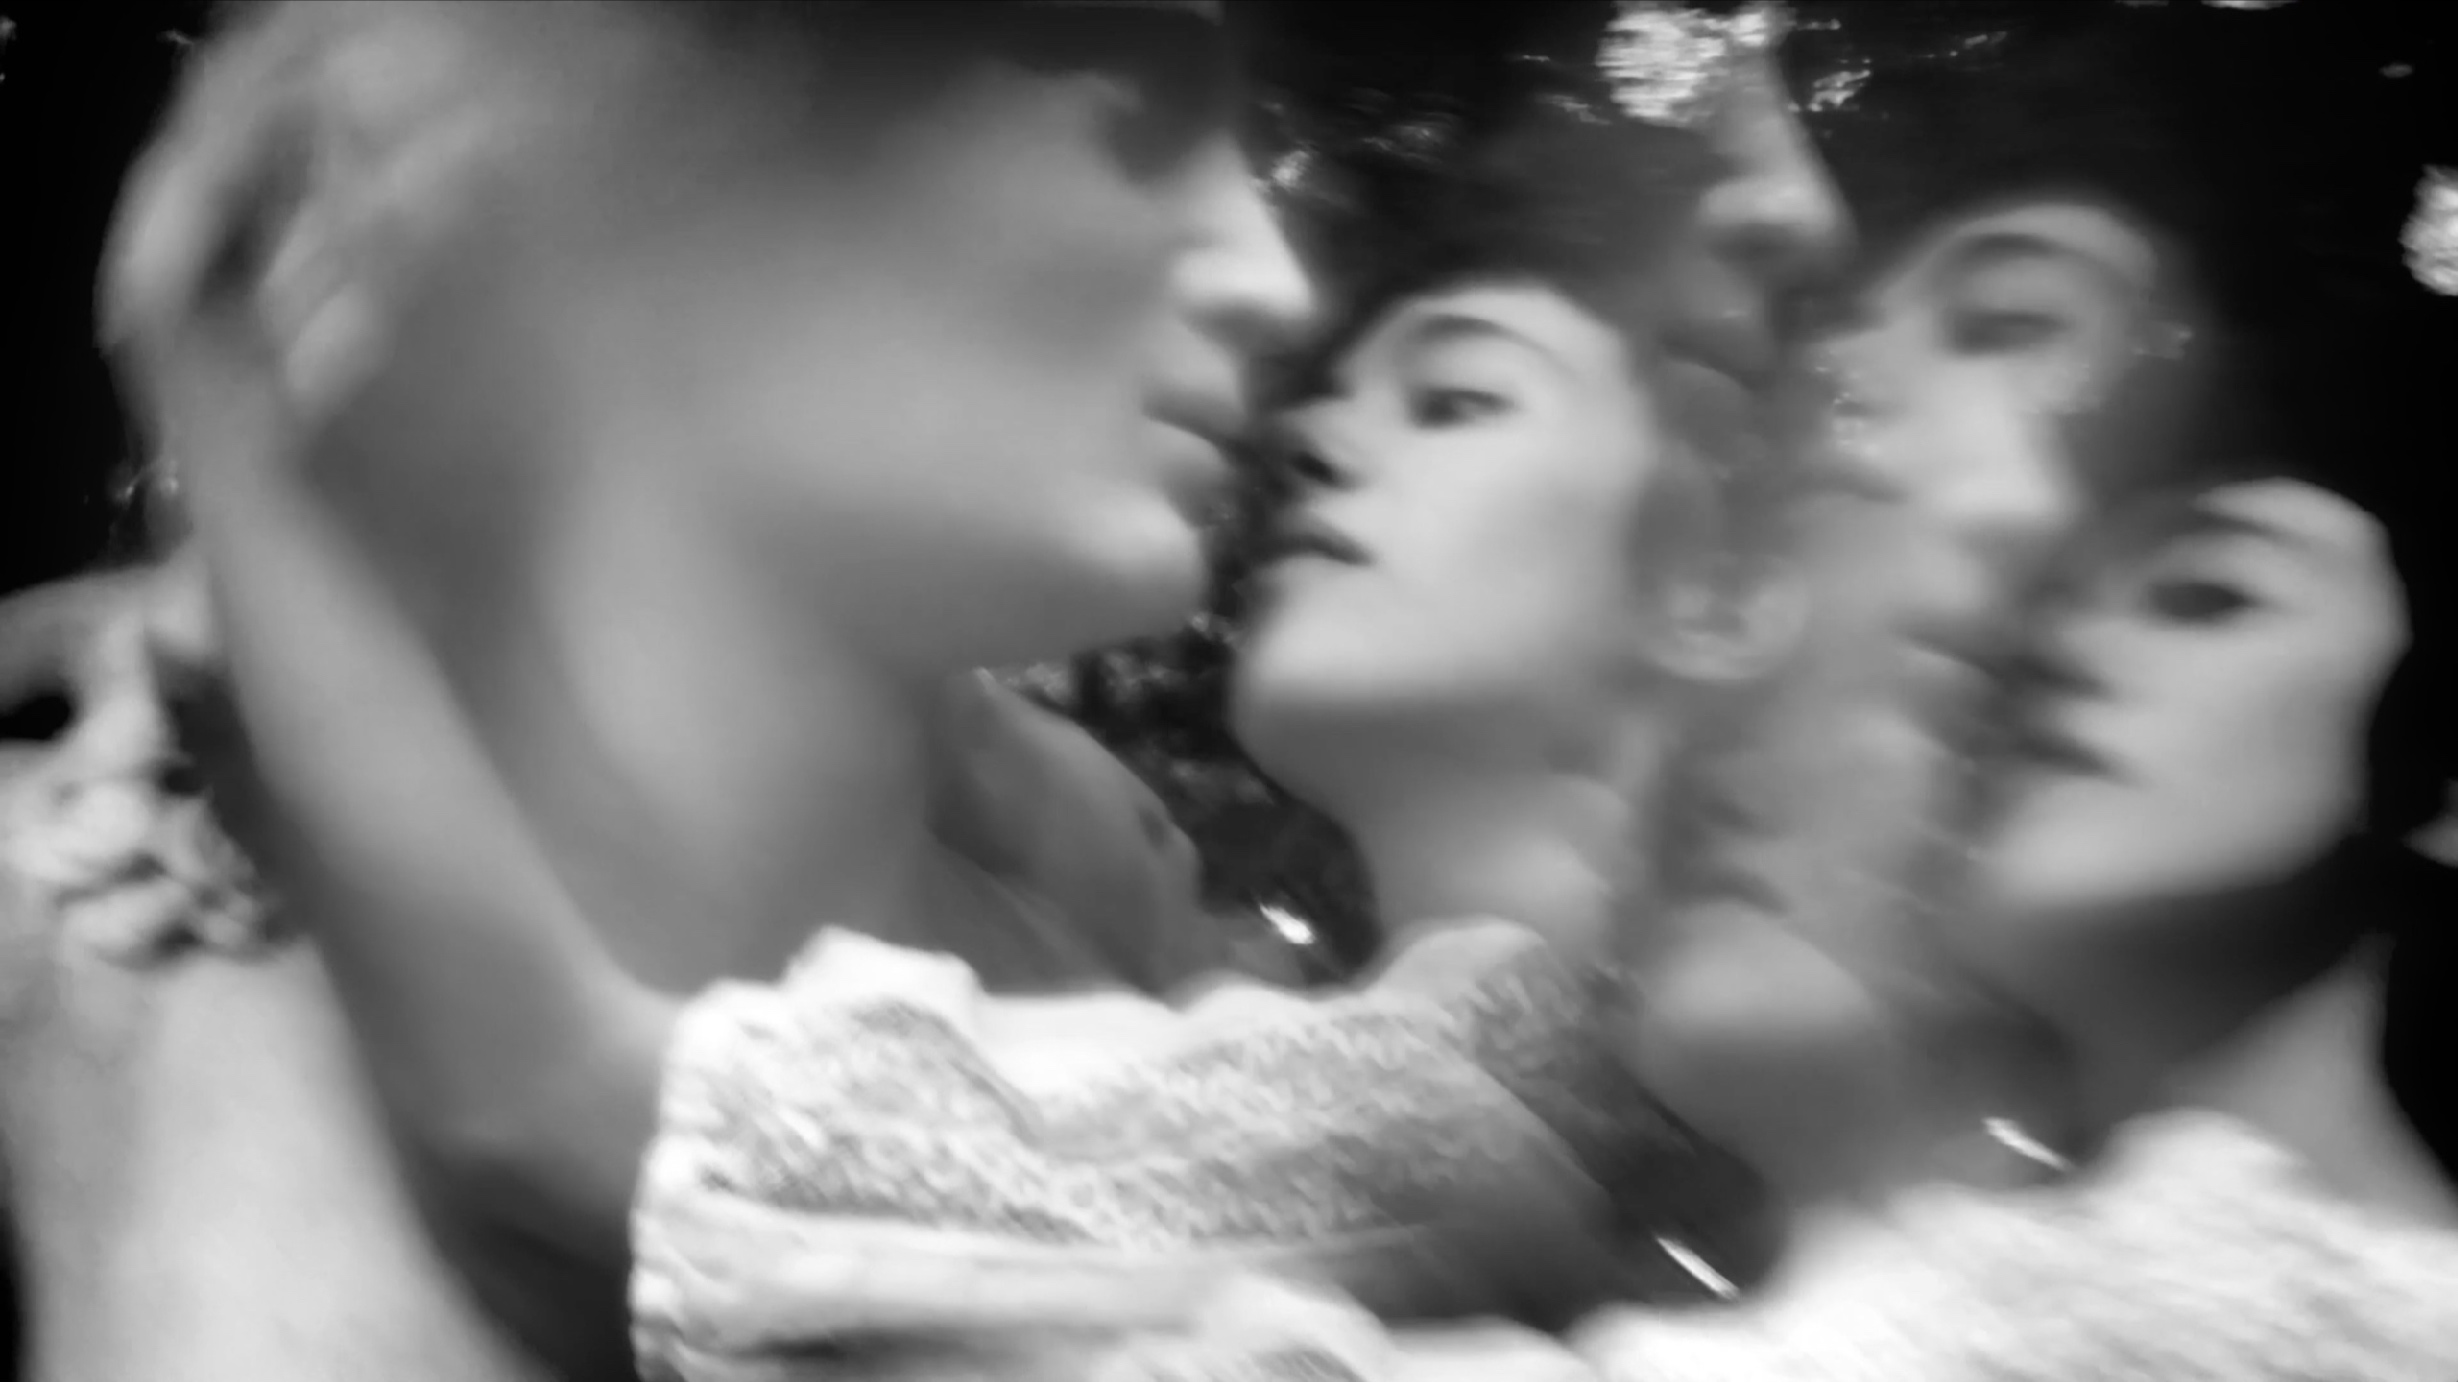 Marta Luné in a film by Renata Zhigulina for Libraría: The Night Garden, 2018